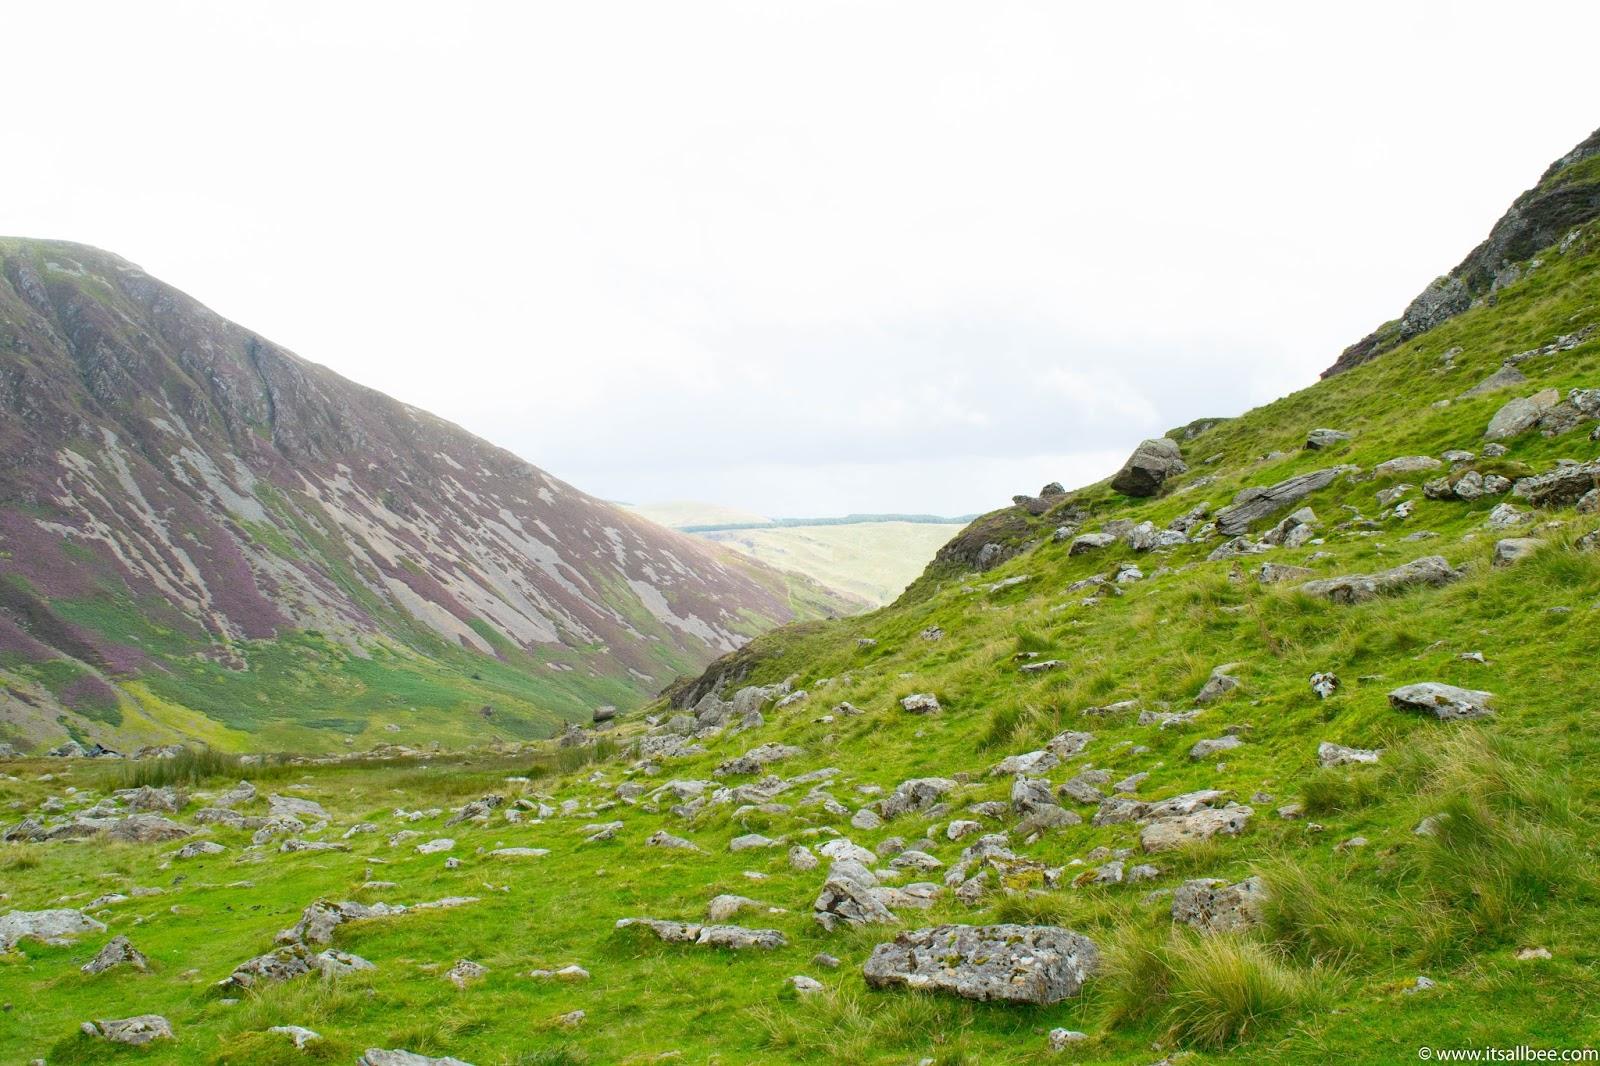 Climbing Snowdon - Hiking to Cadair Idris